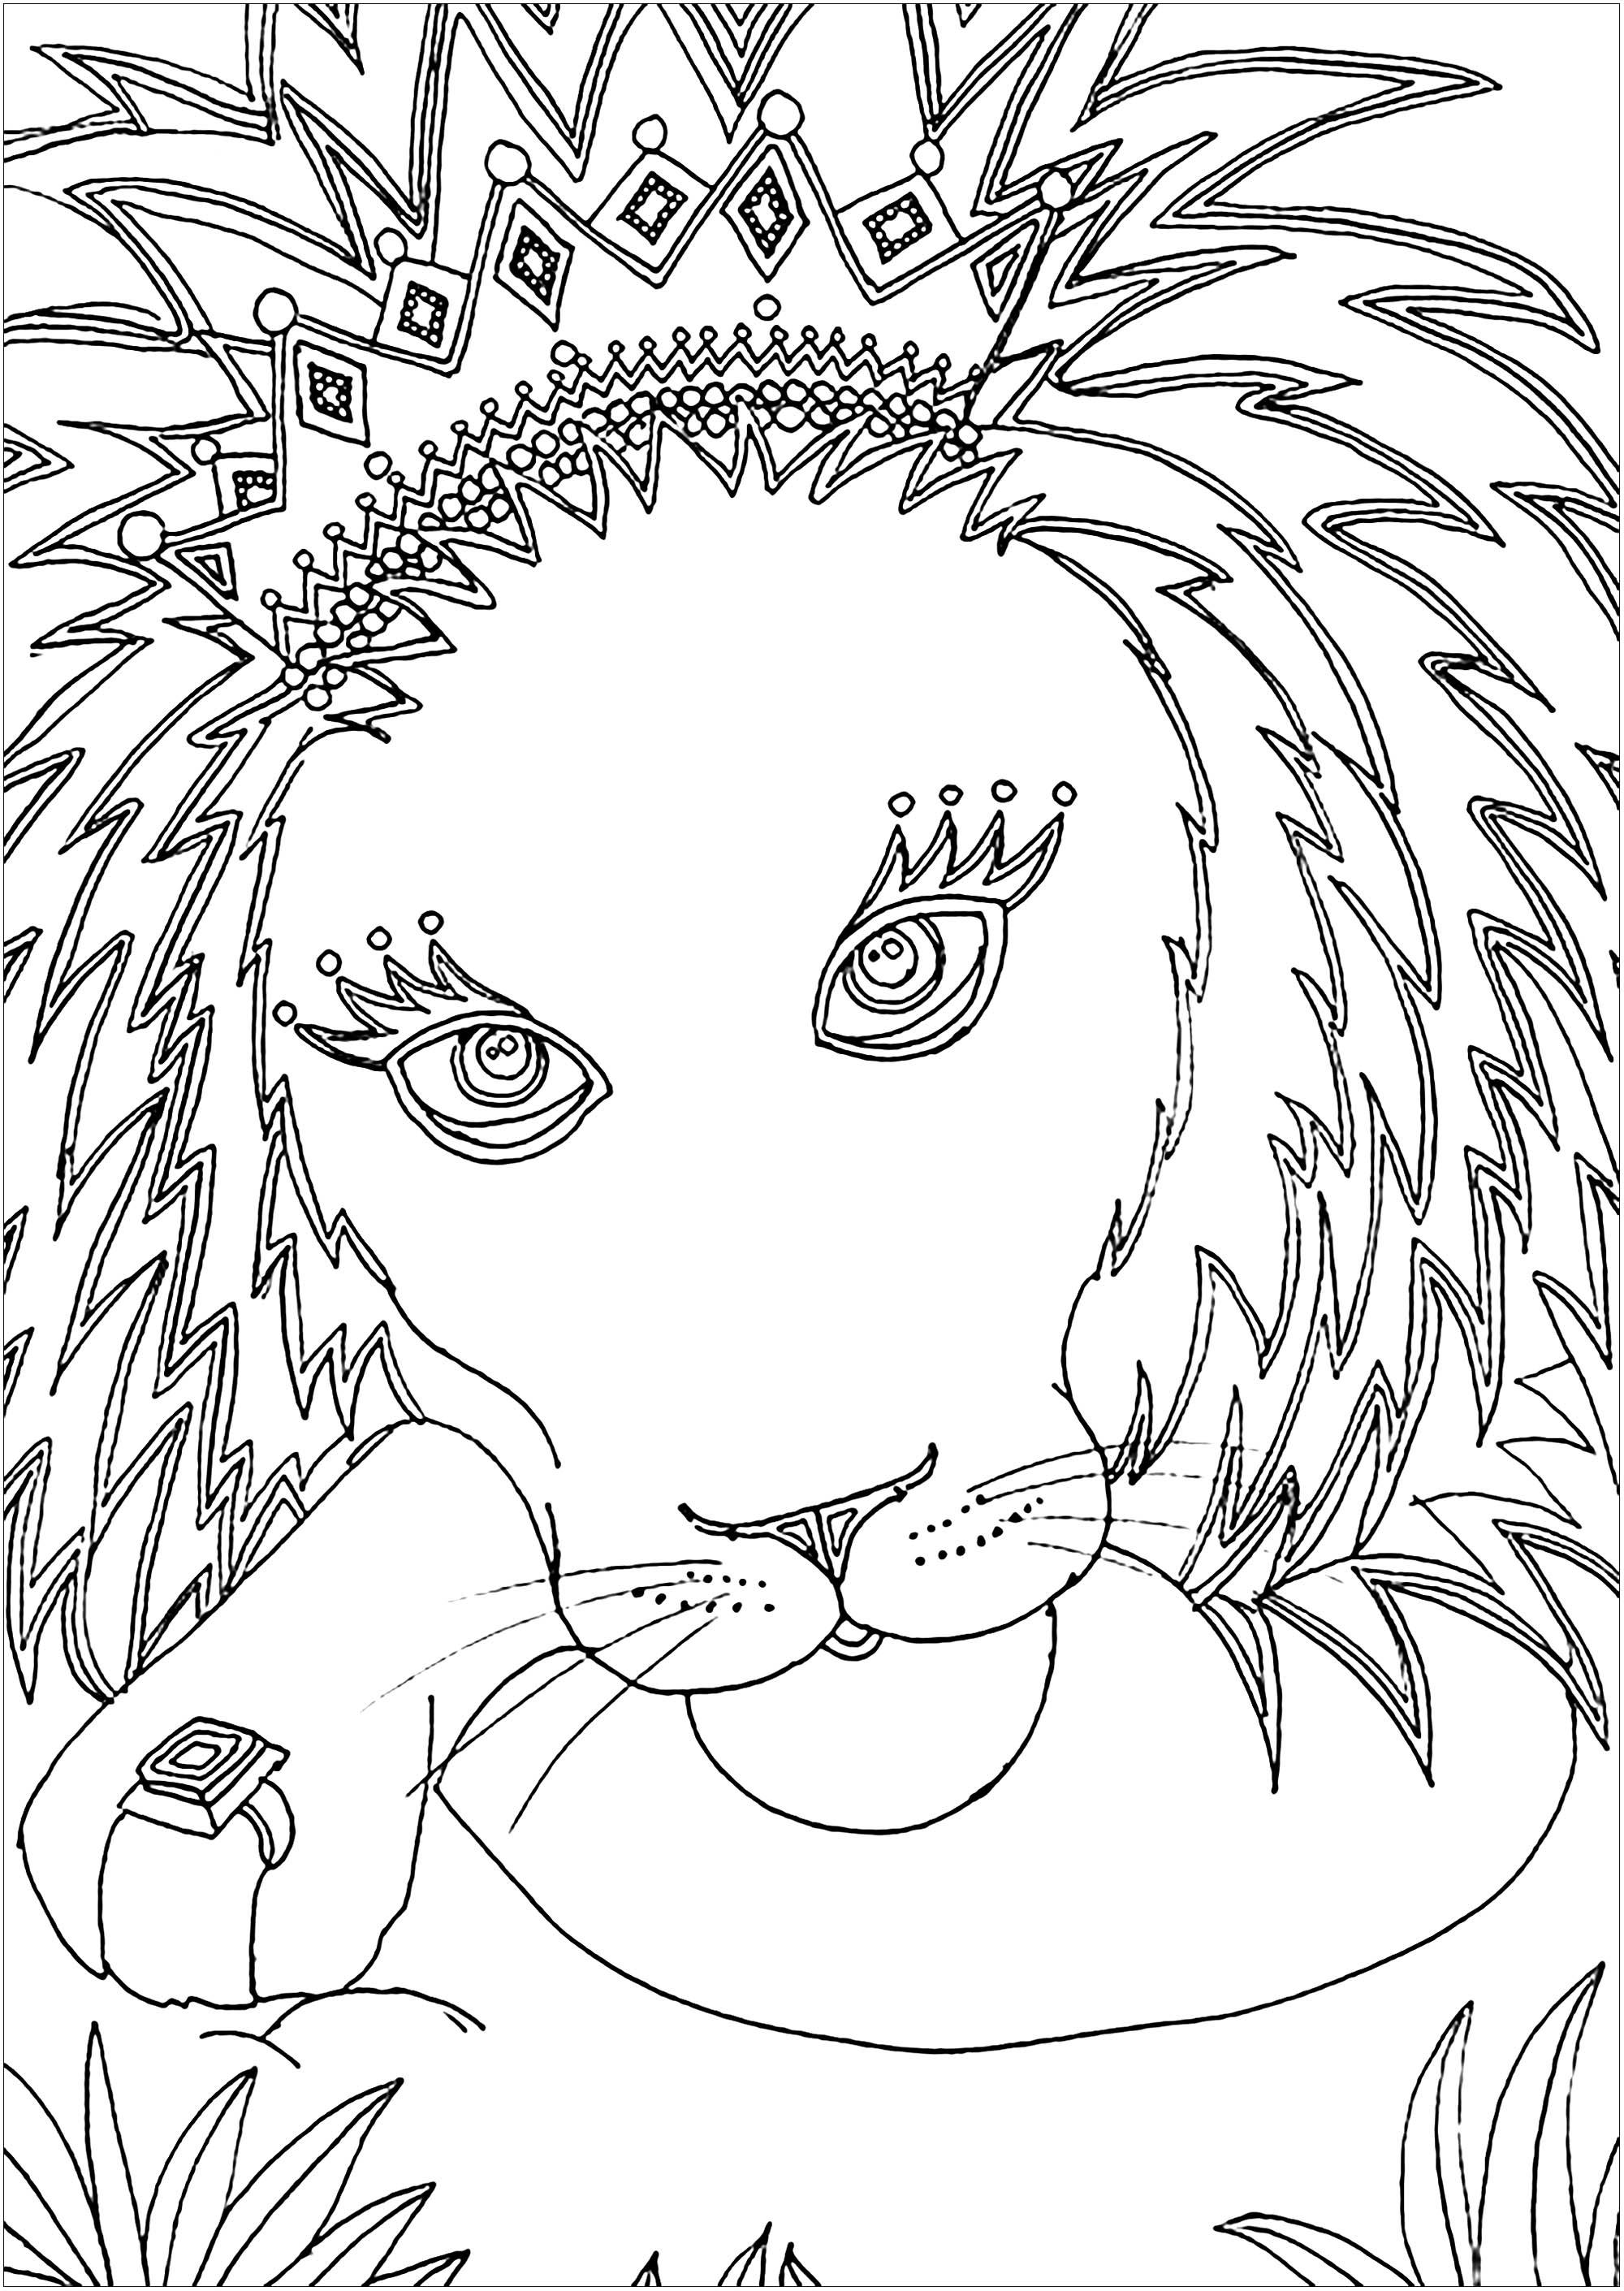 Lion avec sa couronne